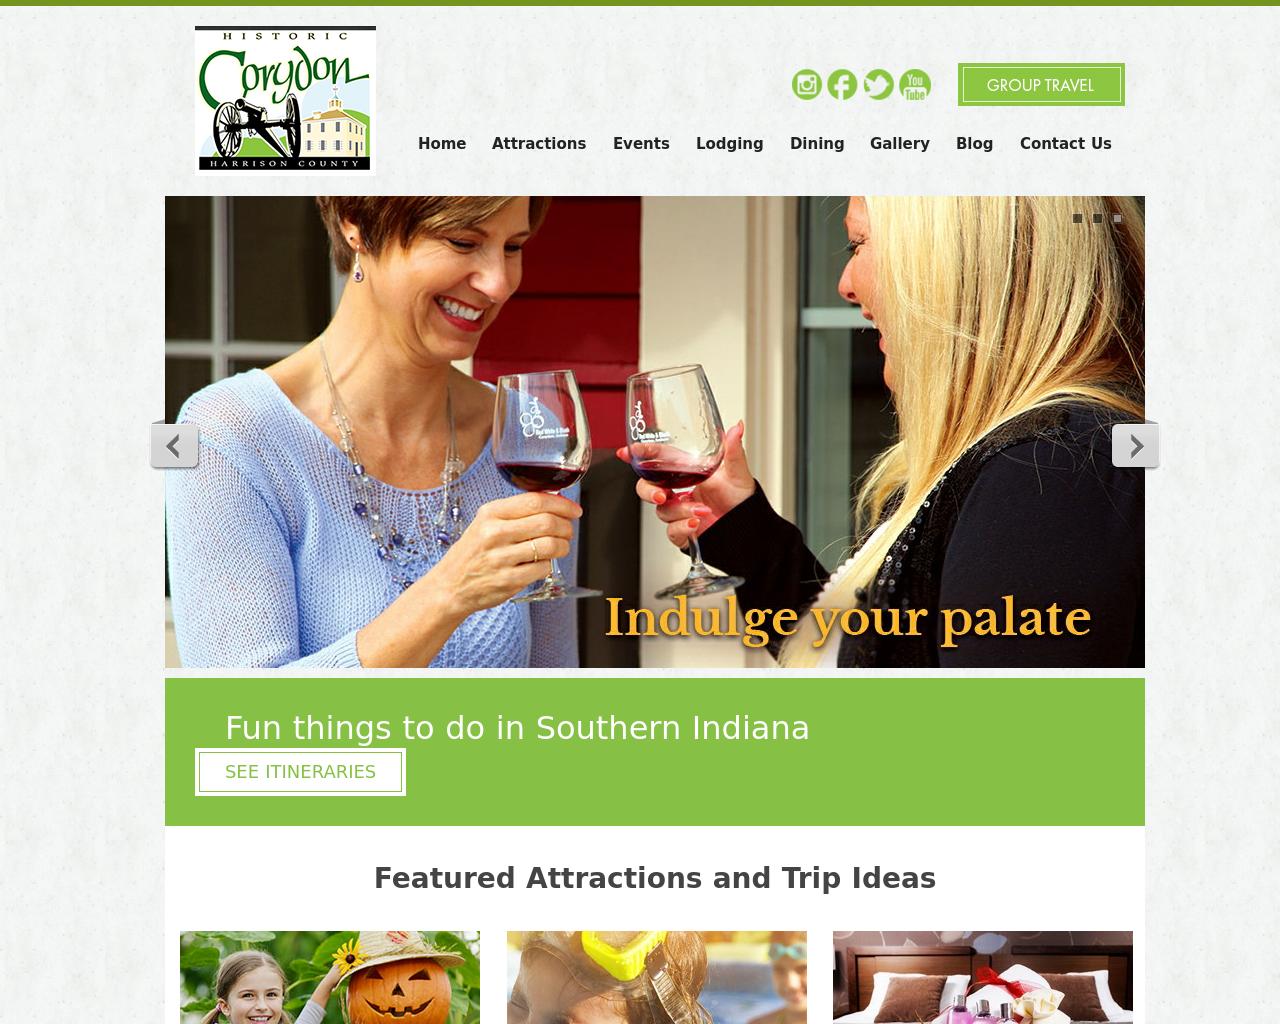 Historic-Corydon-Advertising-Reviews-Pricing